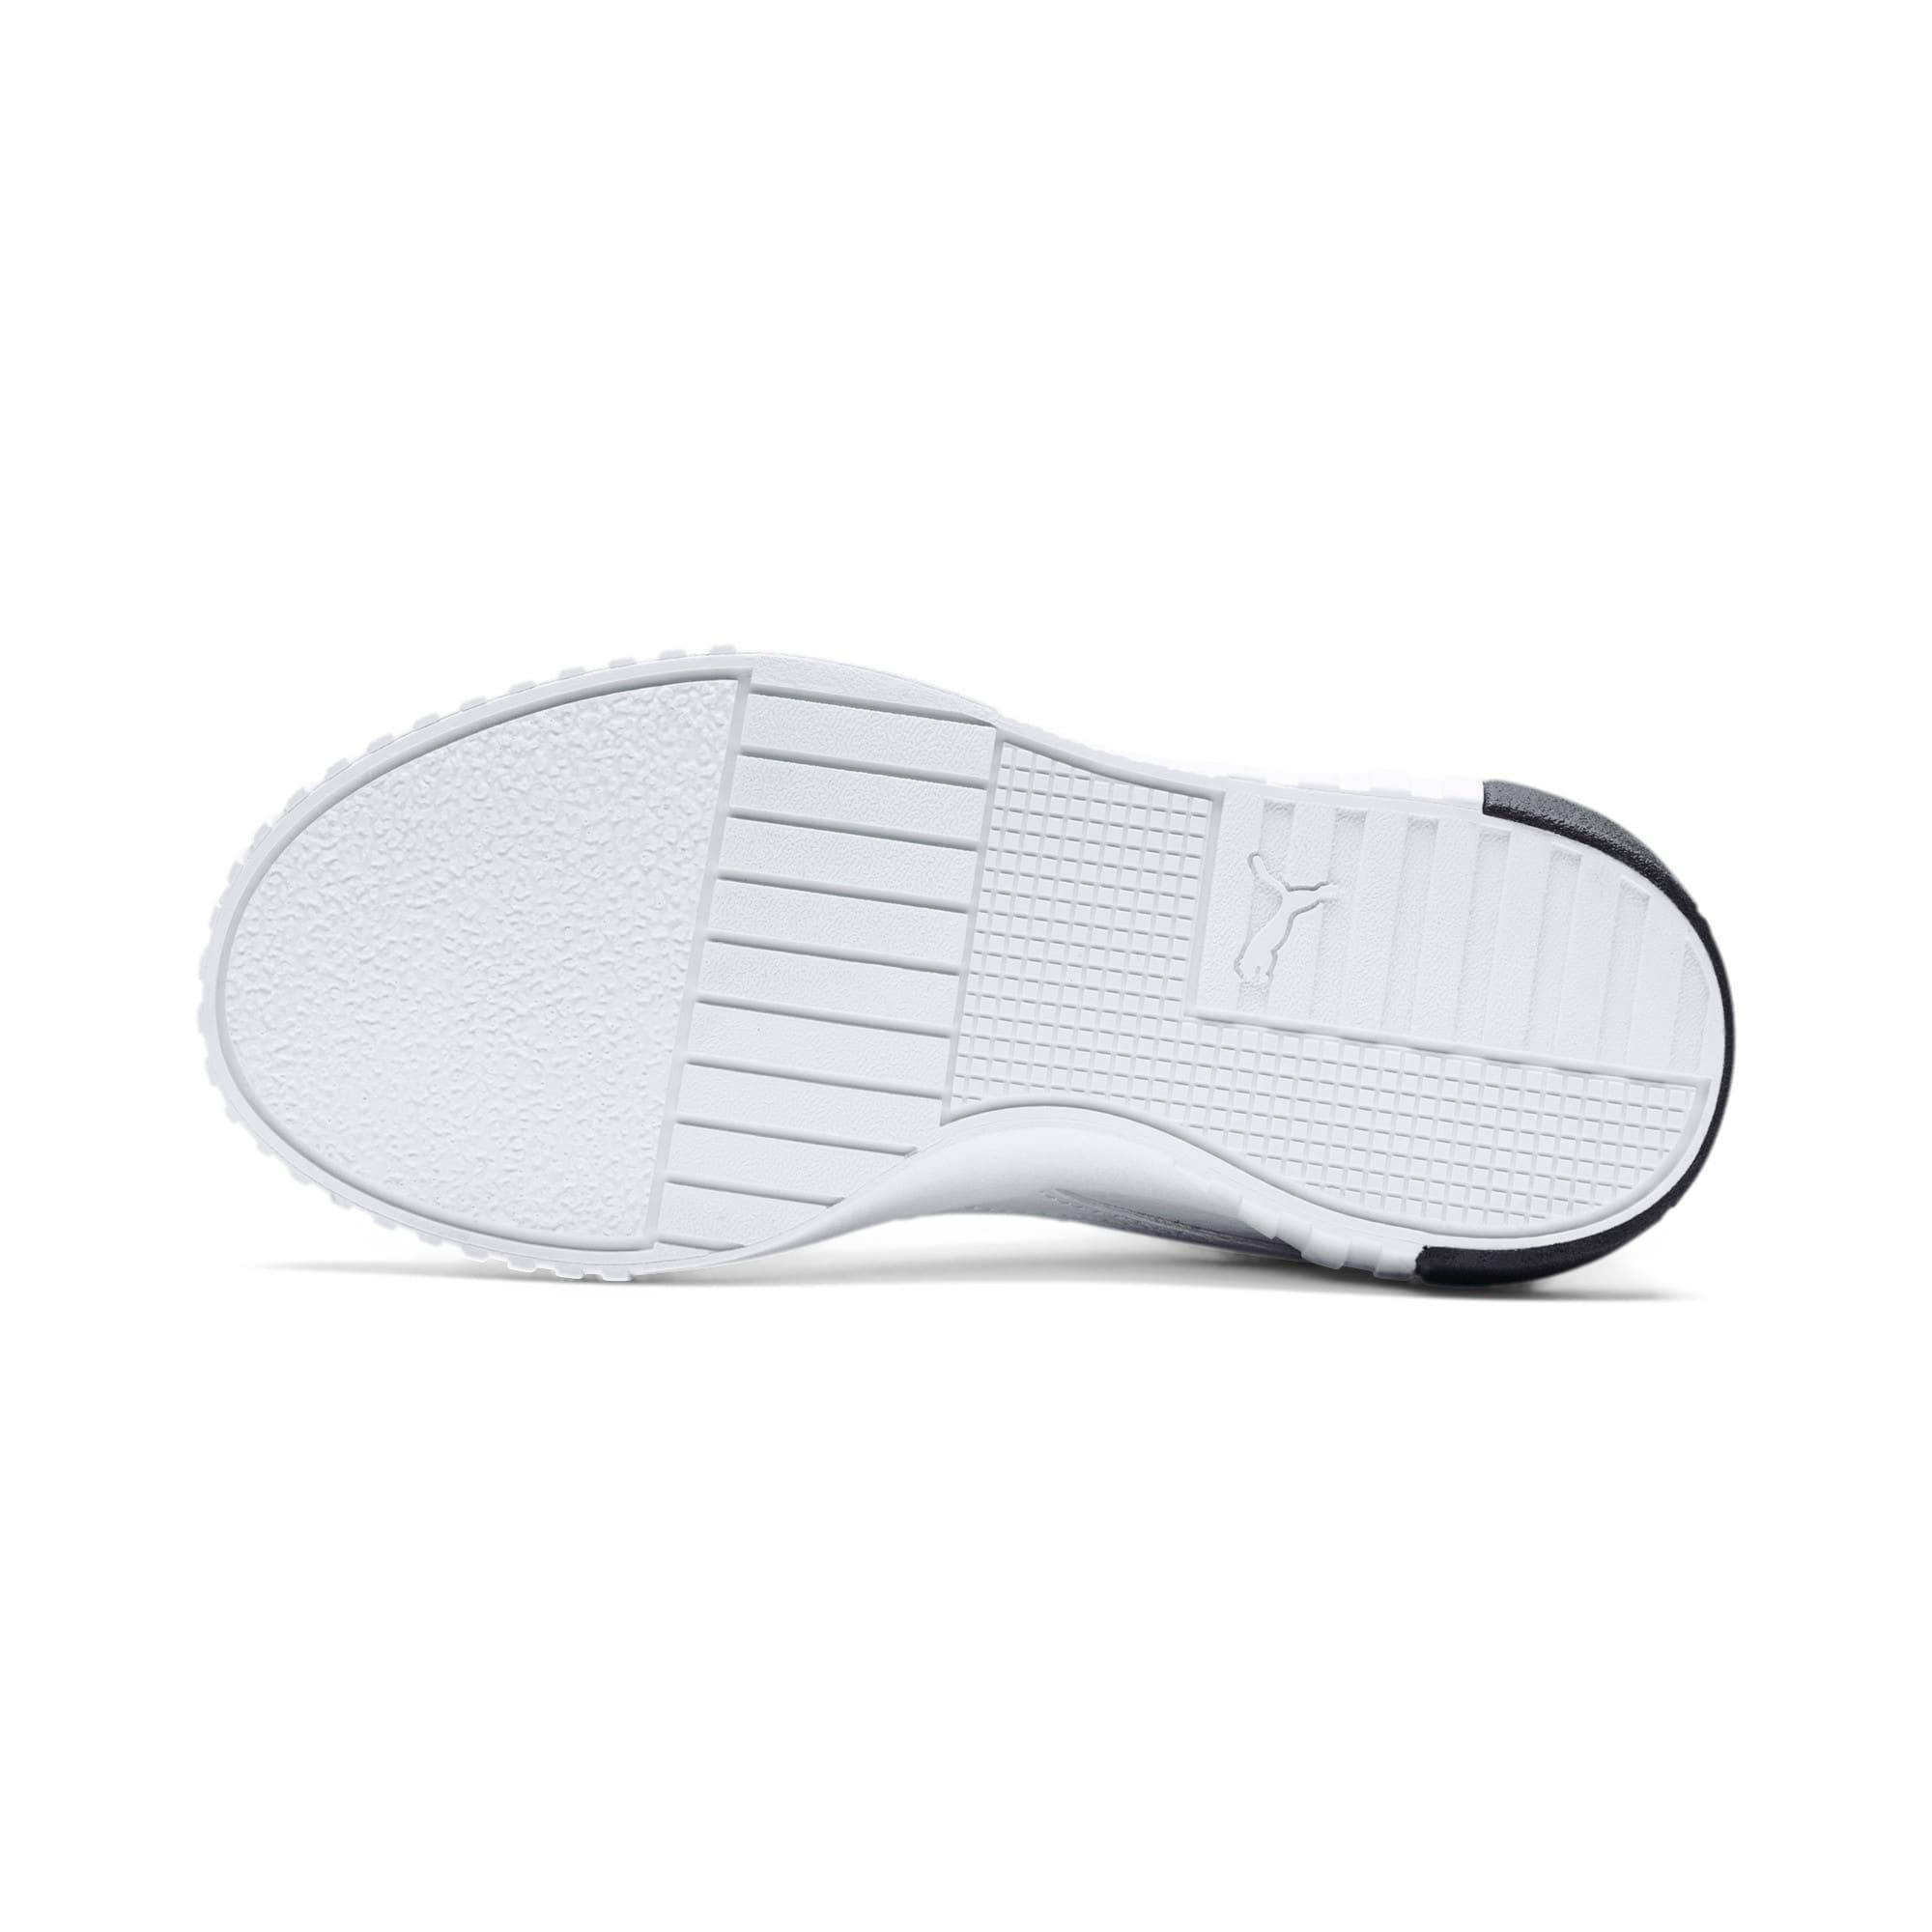 Thumbnail 4 of Cali Kids' Mädchen Sneaker, Puma White-Puma Black, medium